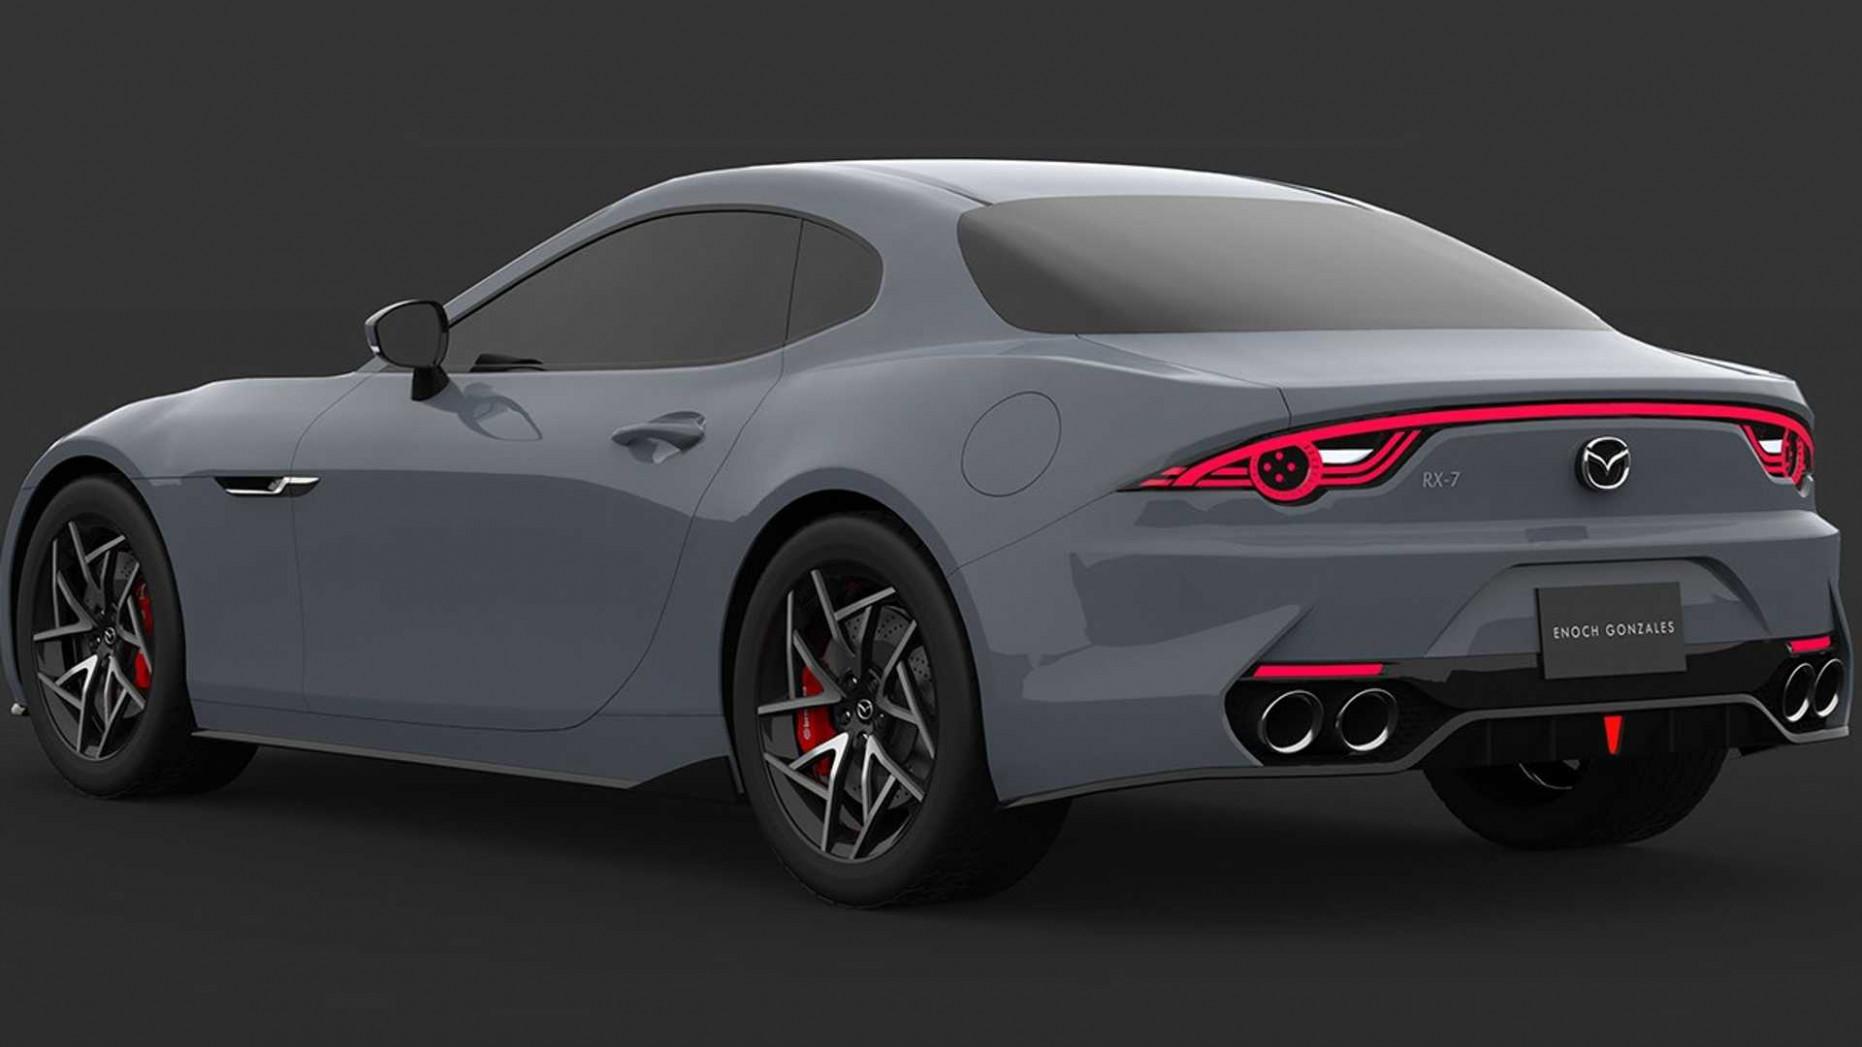 Exterior 2022 Mazda RX7s